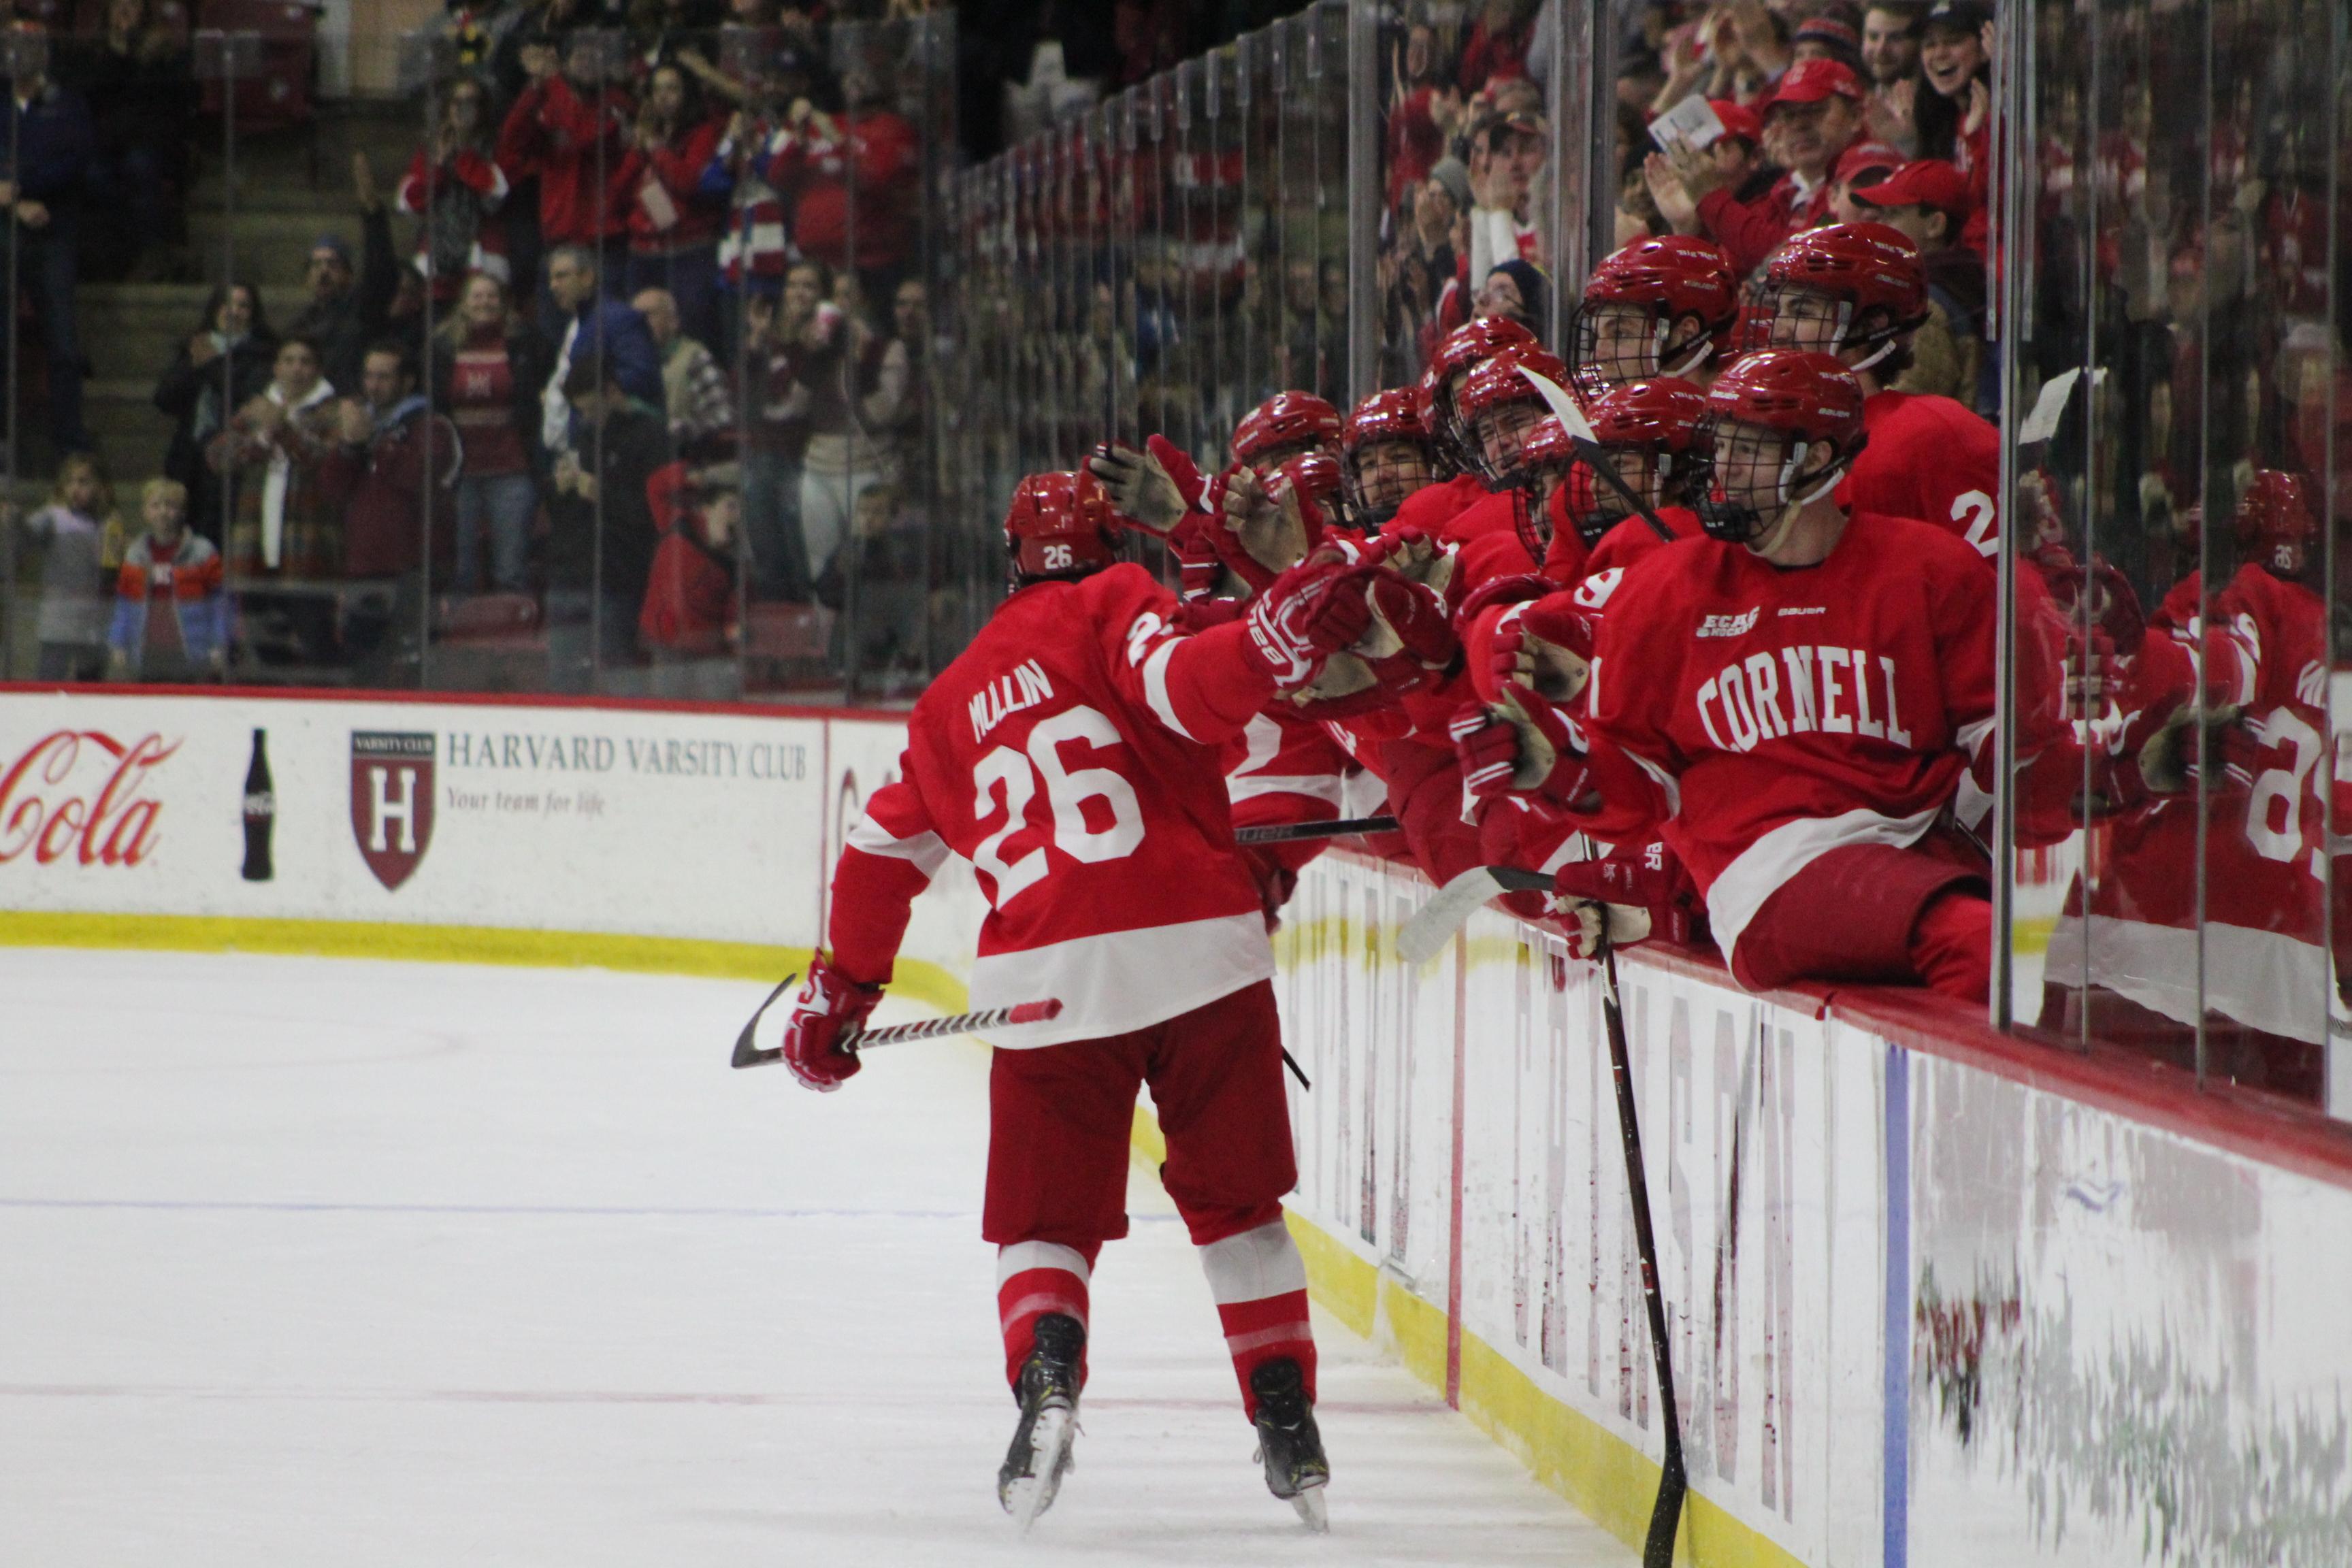 ECAC: Injury-Depleted No. 16 Men's Hockey Earns Redemption Win At Harvard